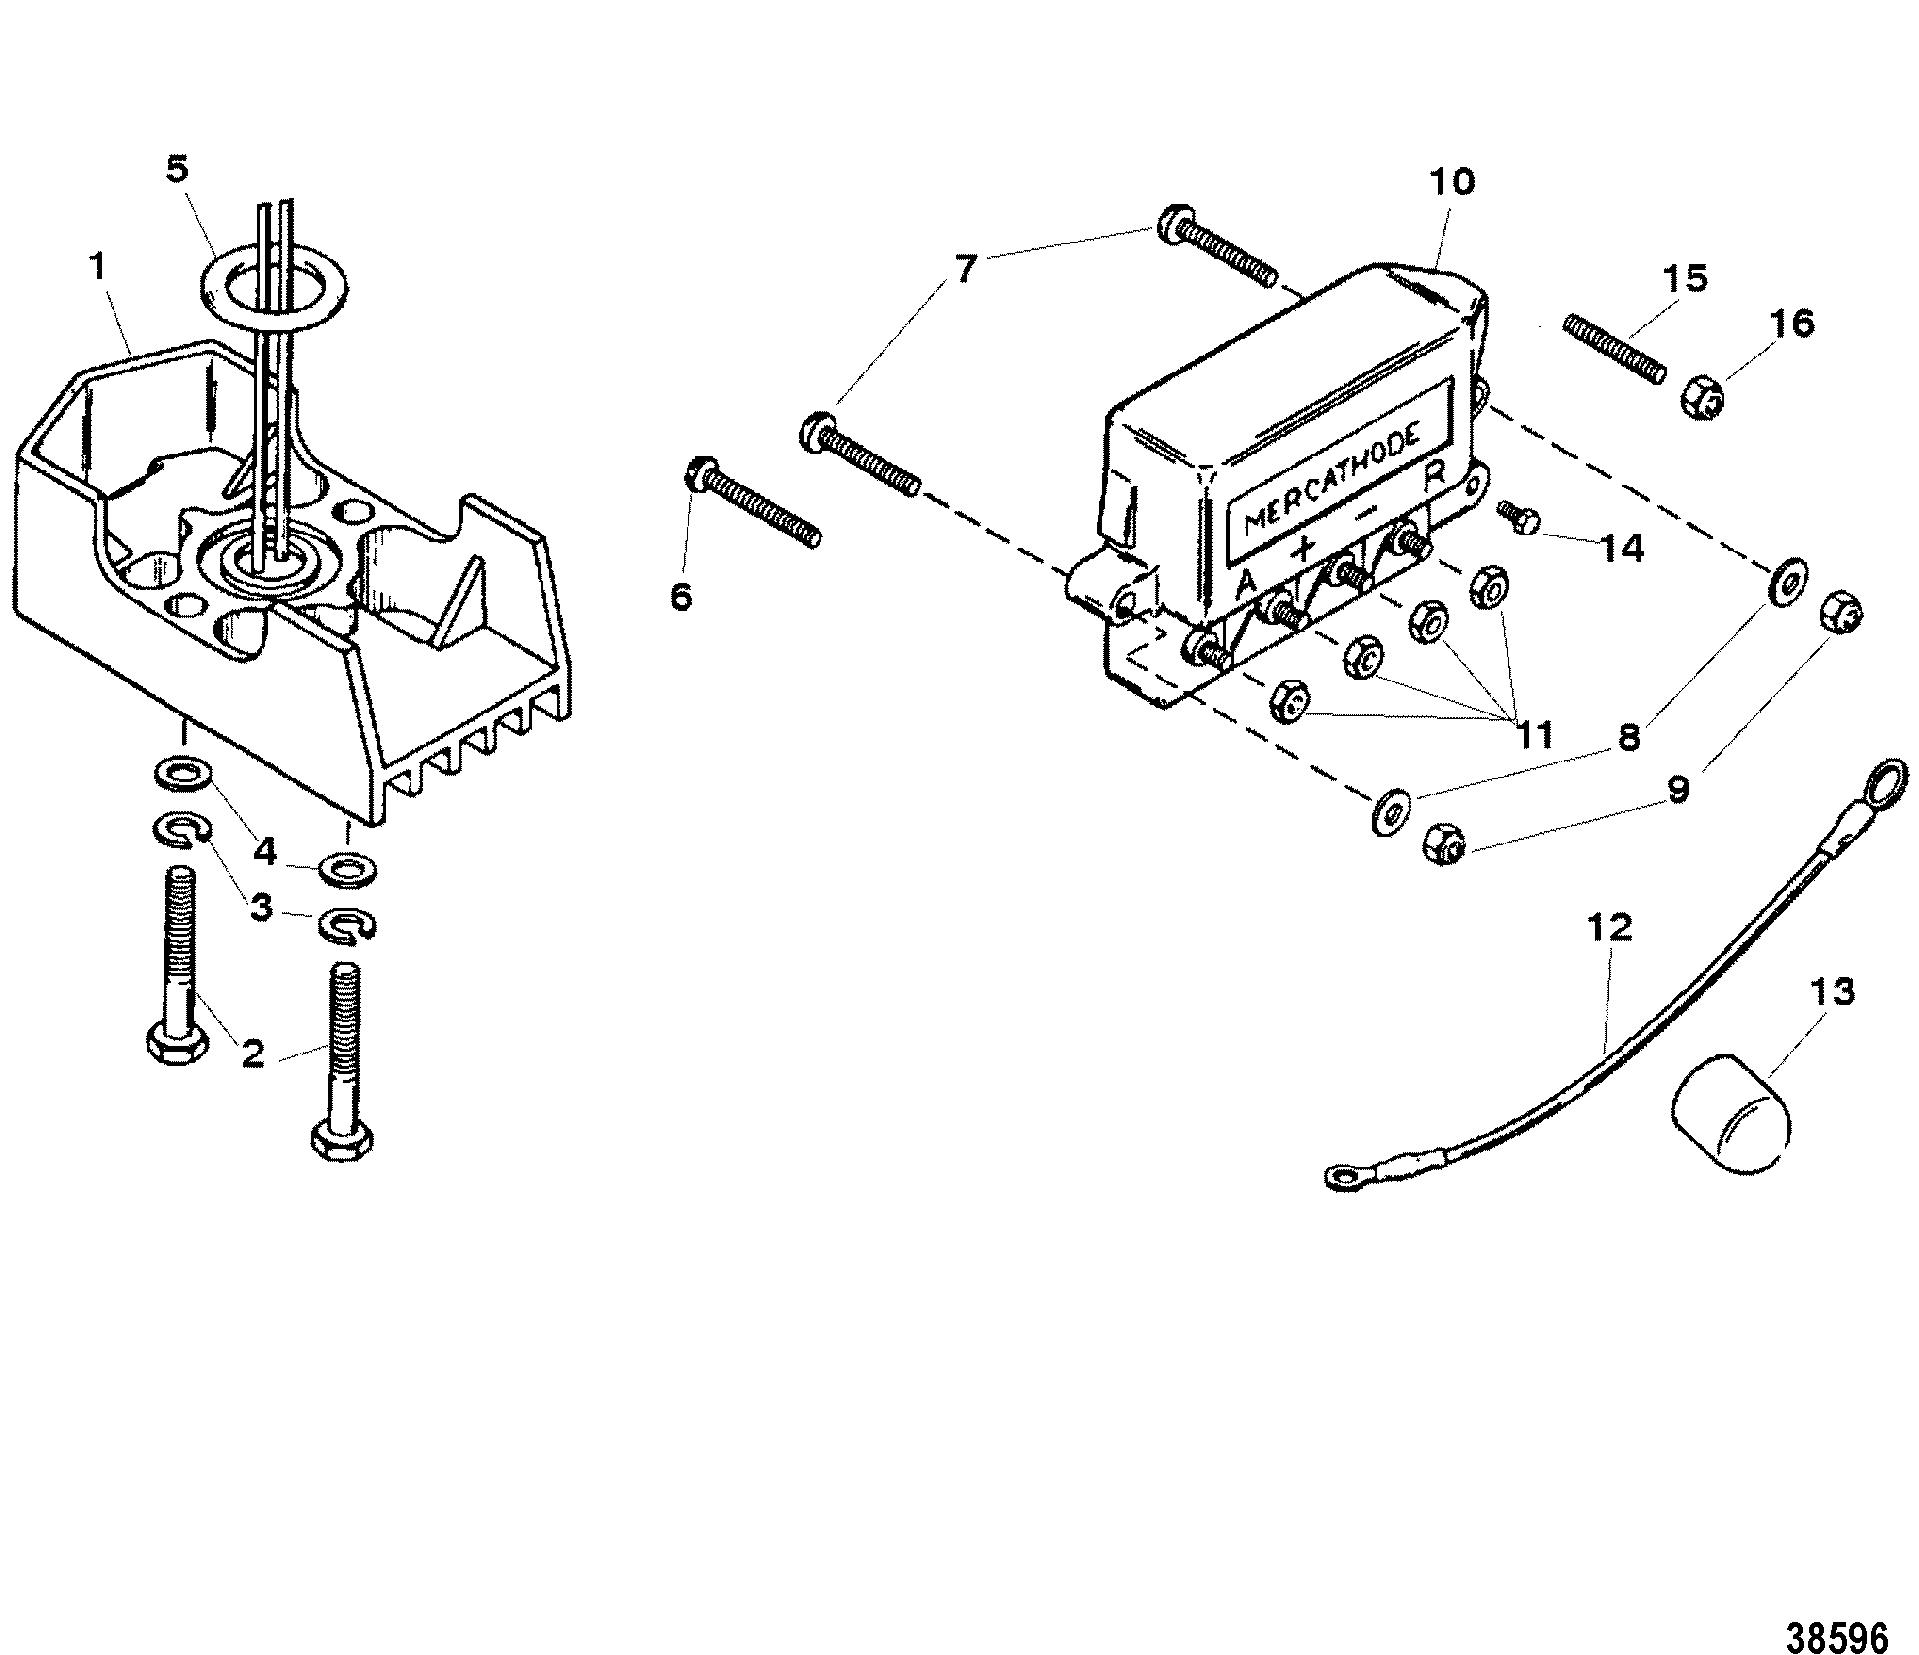 Mercathode Components For Mercruiser 7 4l 454 Mag Bravo Gen V